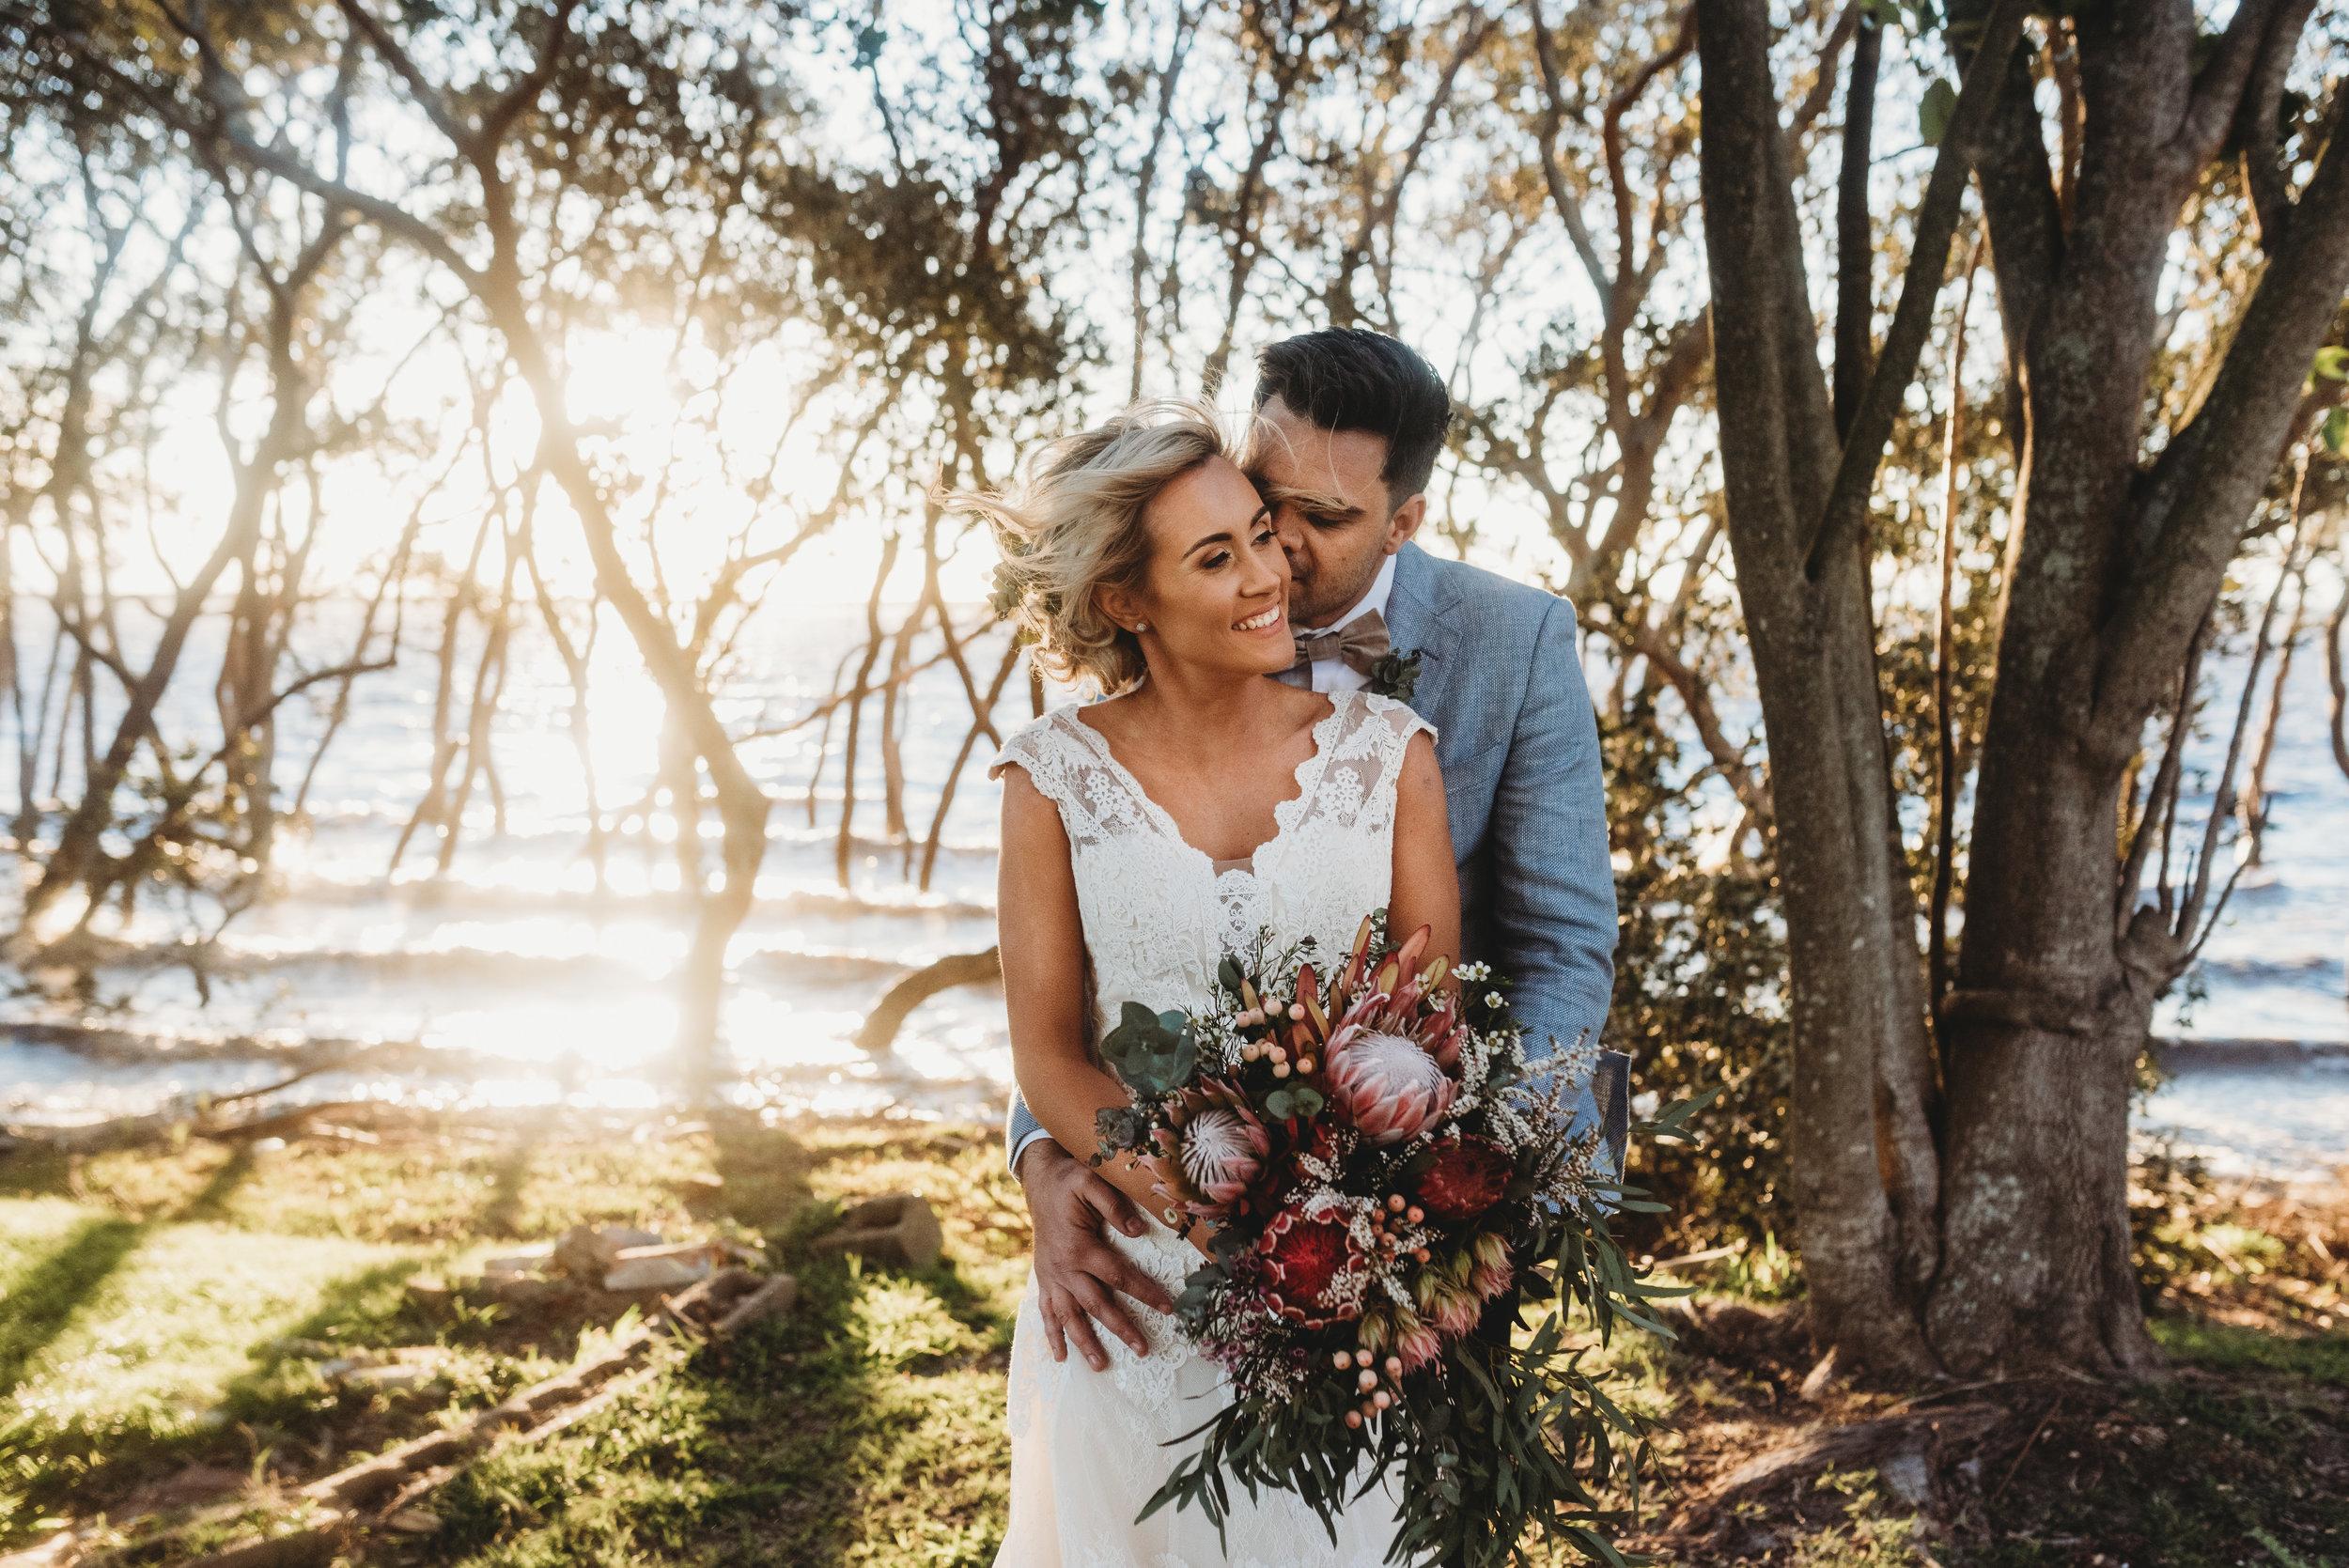 Sofi & Ryan - Stanley Park, Newcastle Wedding    10th August 2019